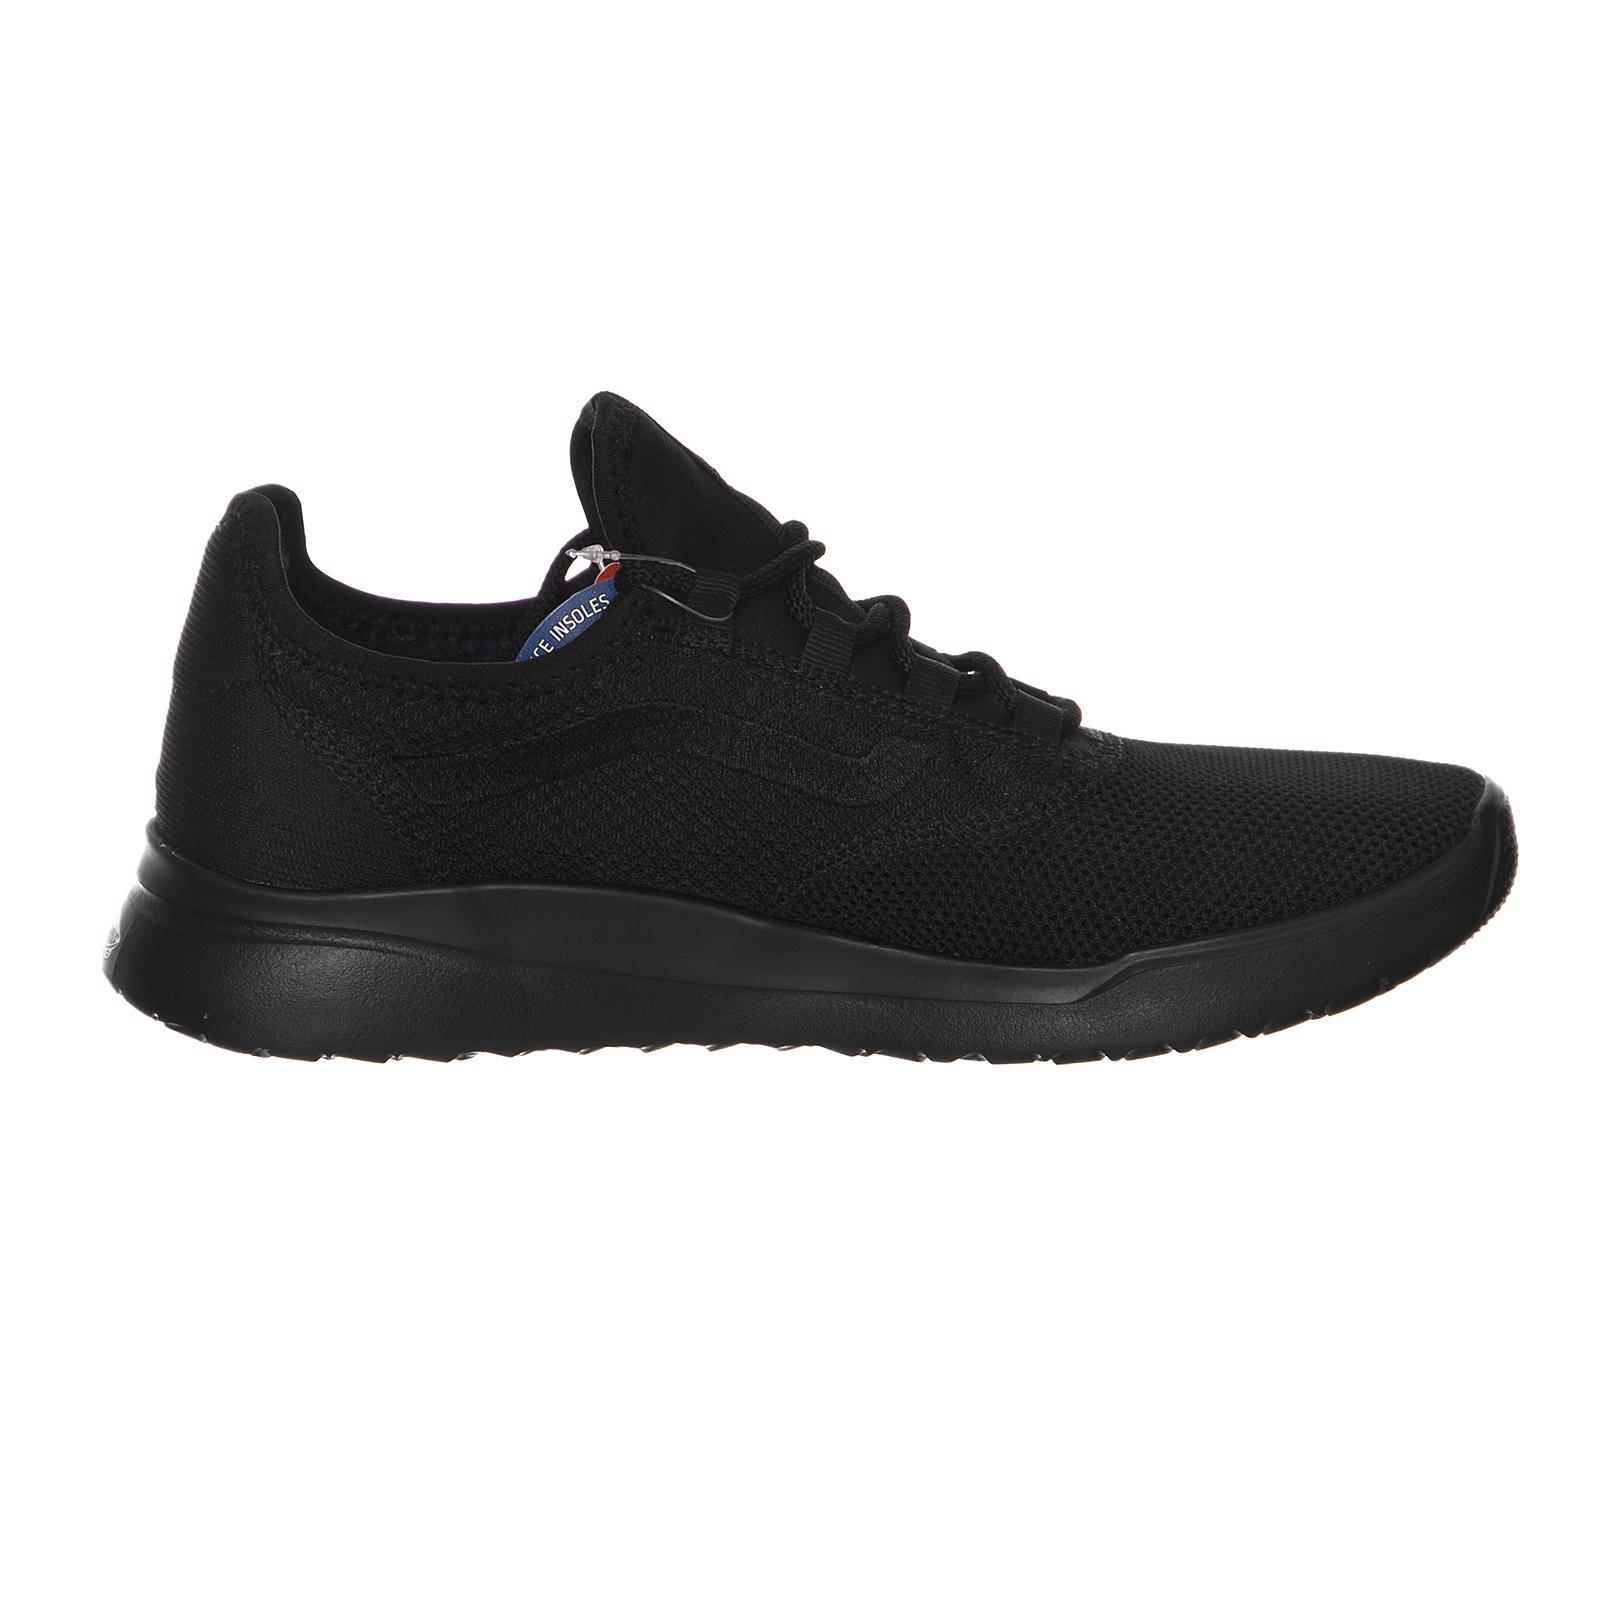 Vans Sneakers Mn Cerus Lite (Mesh) Black Black  f4e836a6a